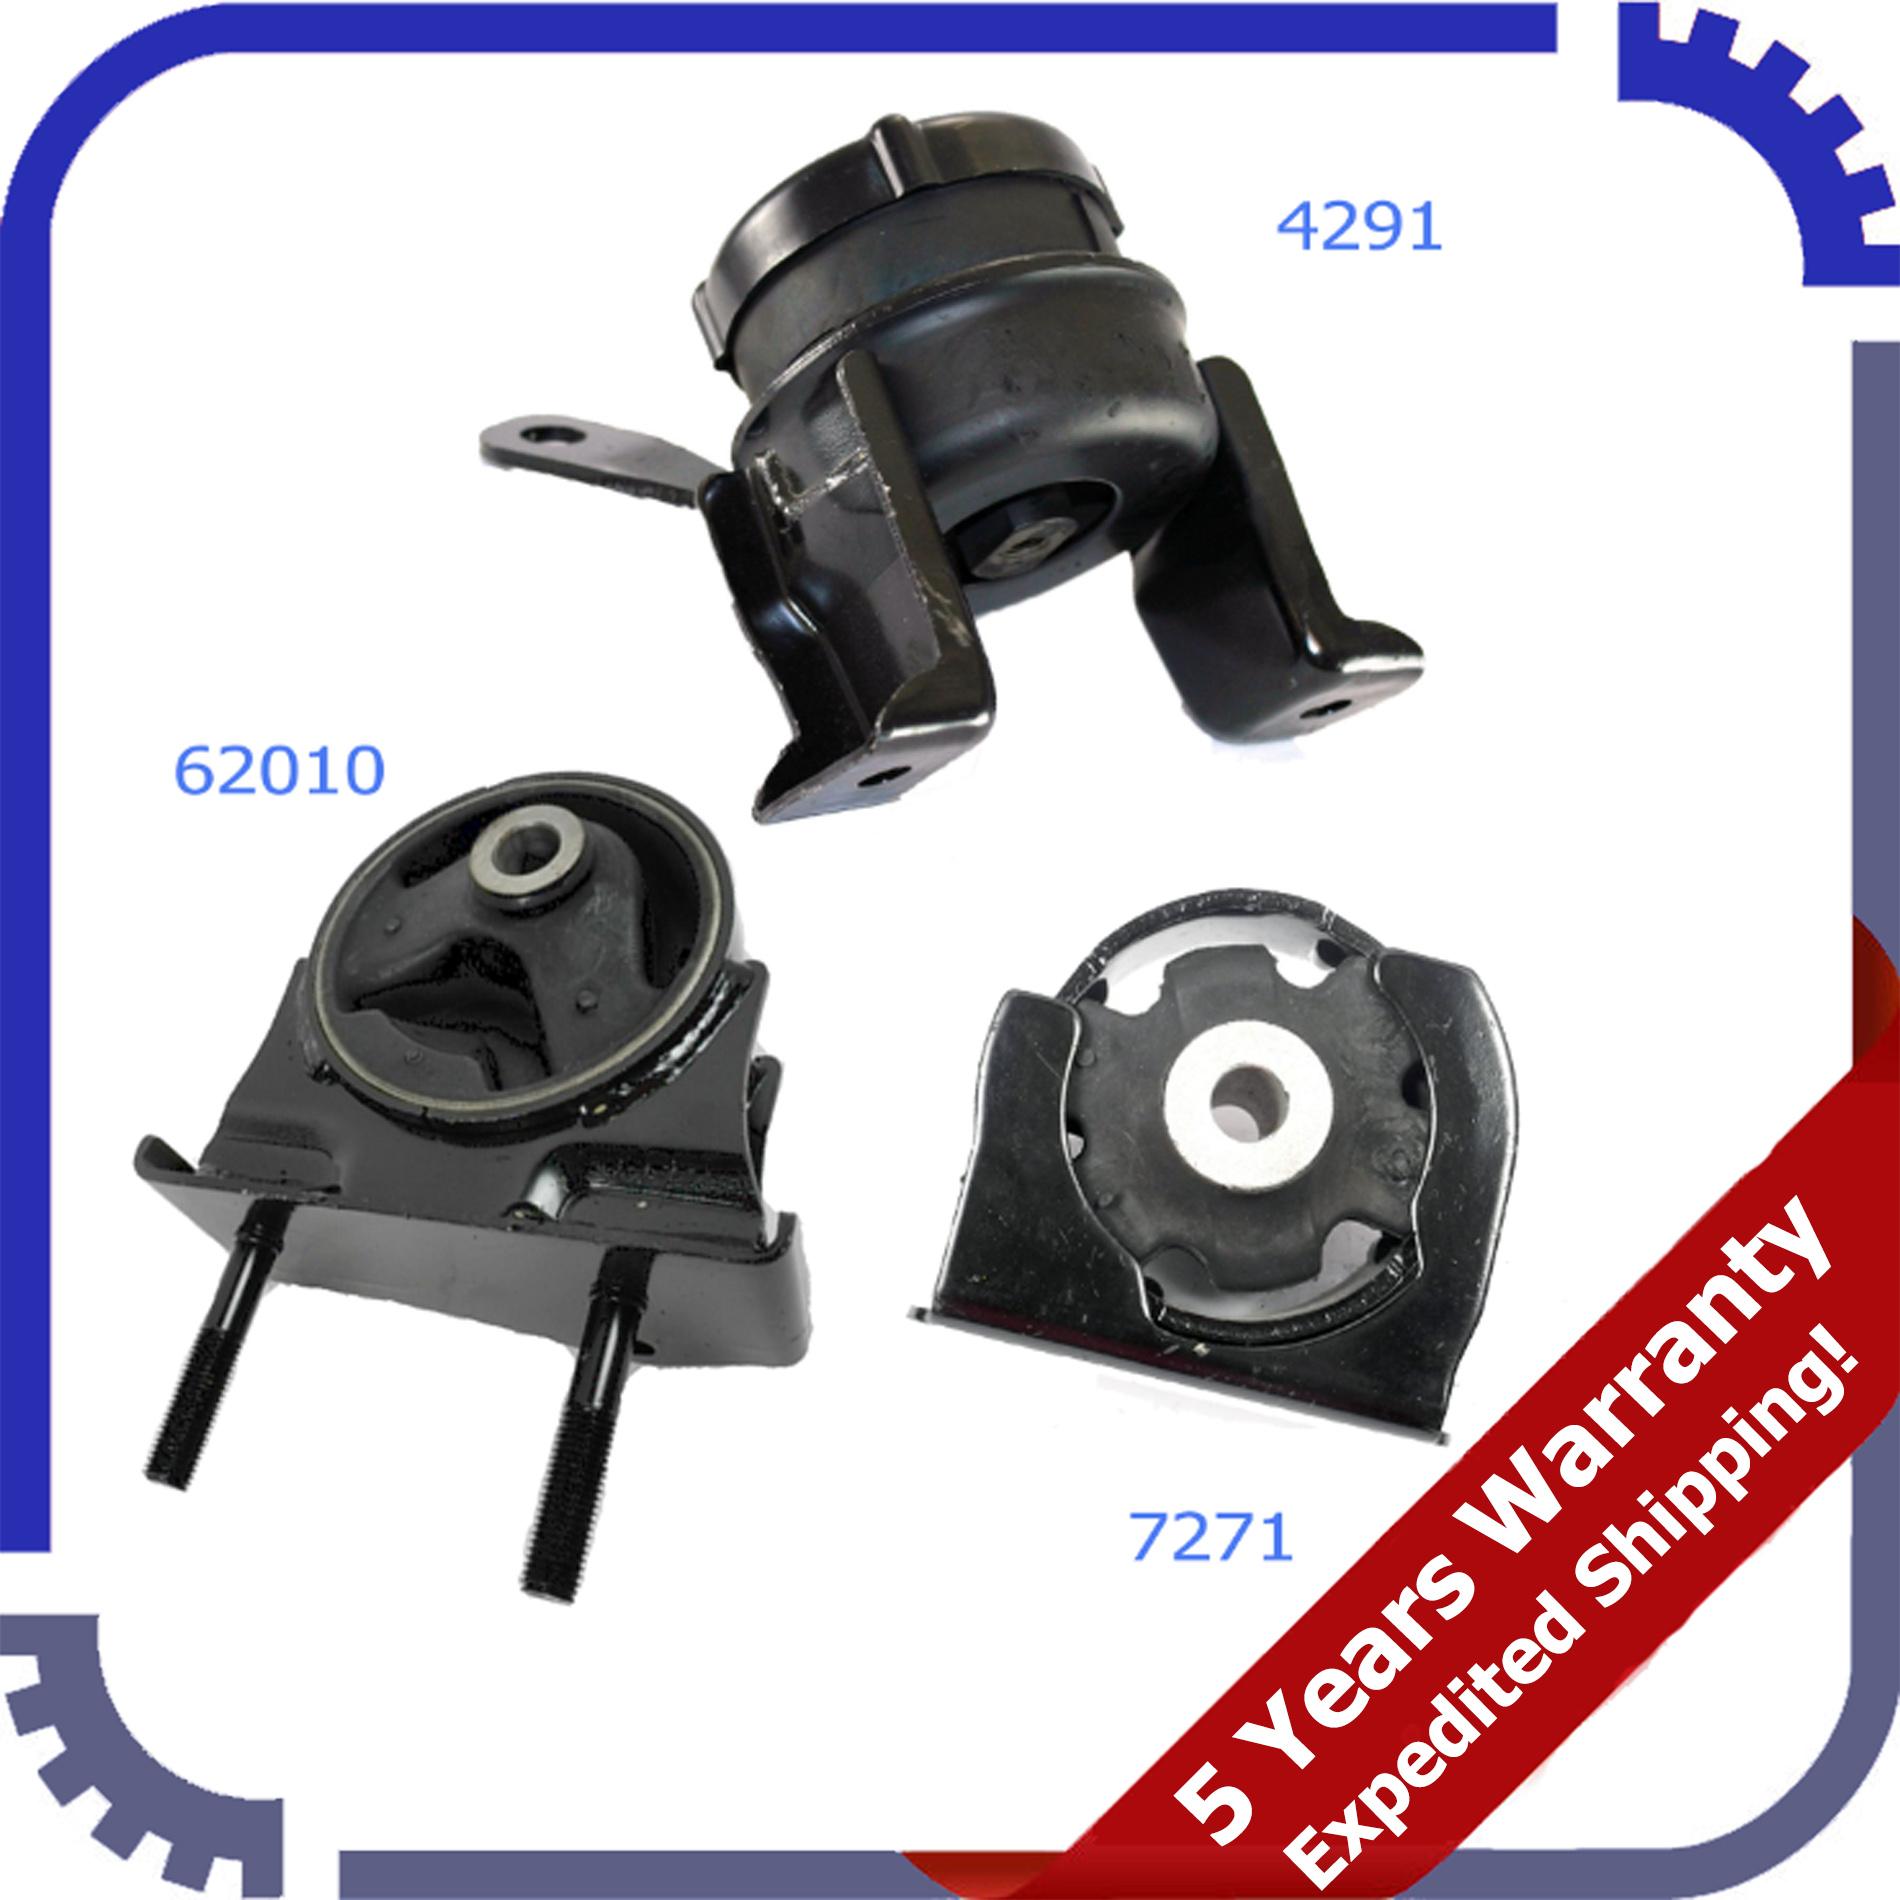 Engine Motor /& Trans Mount Auto For 04-05 Toyota RAV4 2.4L 4265 4291 7271 62010